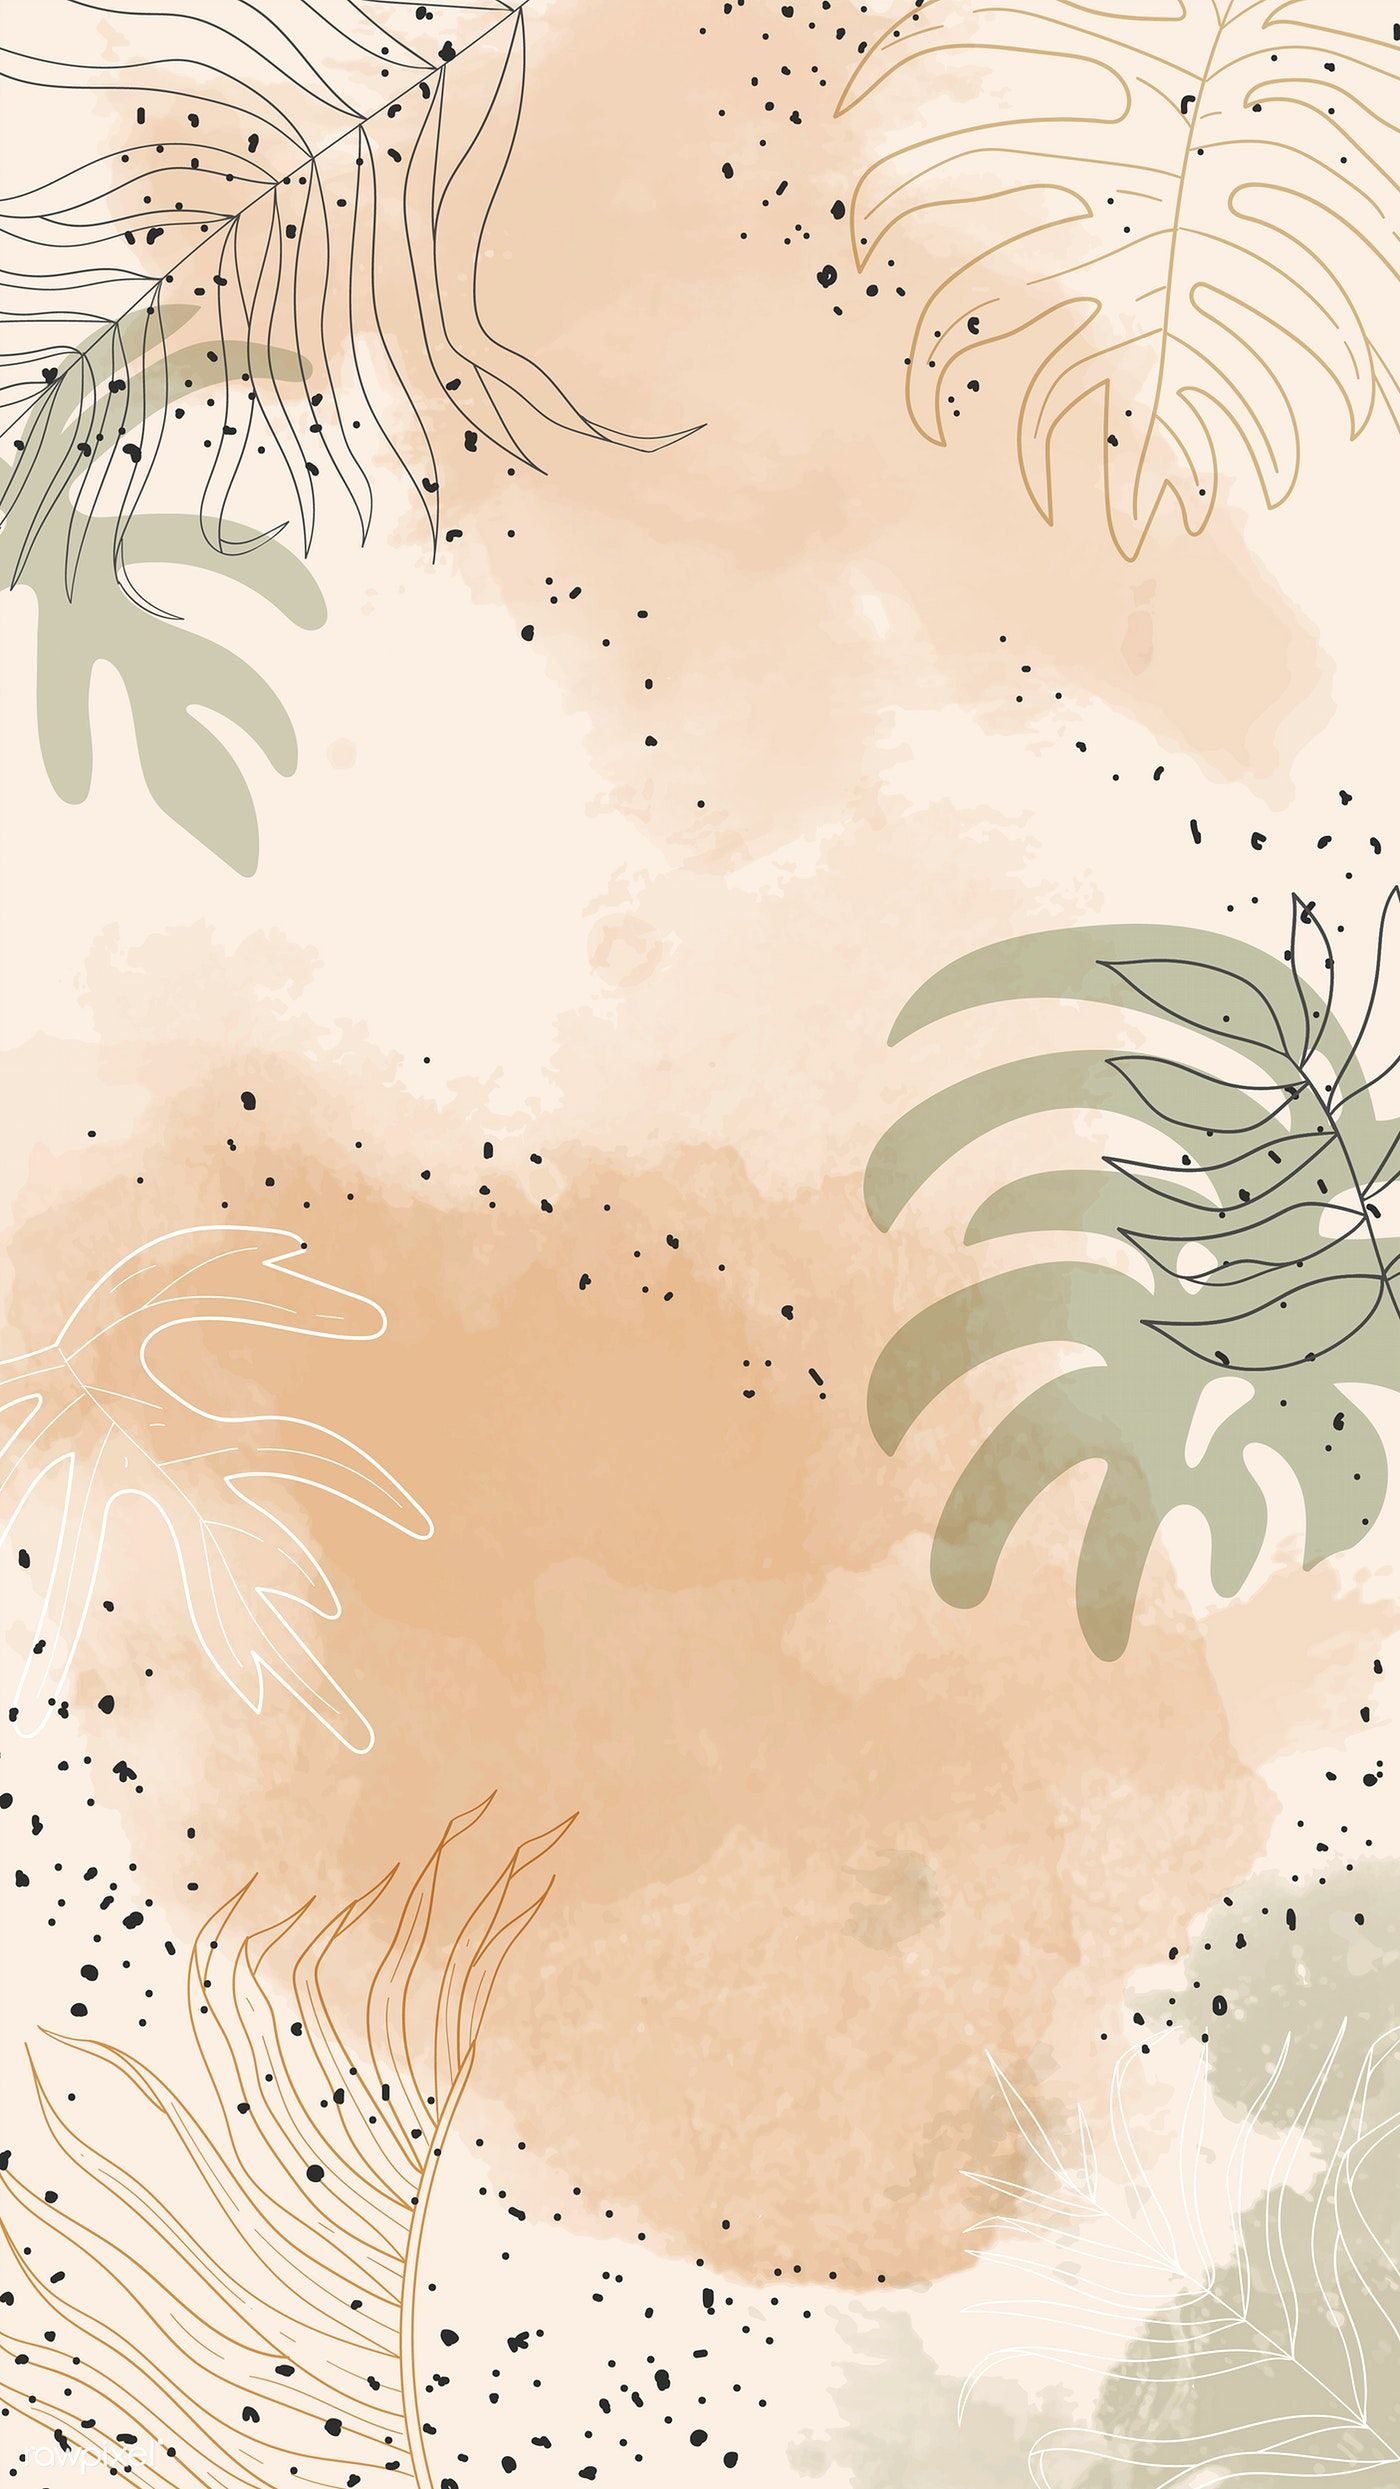 Beige Leafy Watercolor Mobile Phone Wallpaper Vector Premium Image By Rawpixel Com Aum Watercolor Wallpaper Iphone Painting Wallpaper Watercolor Wallpaper